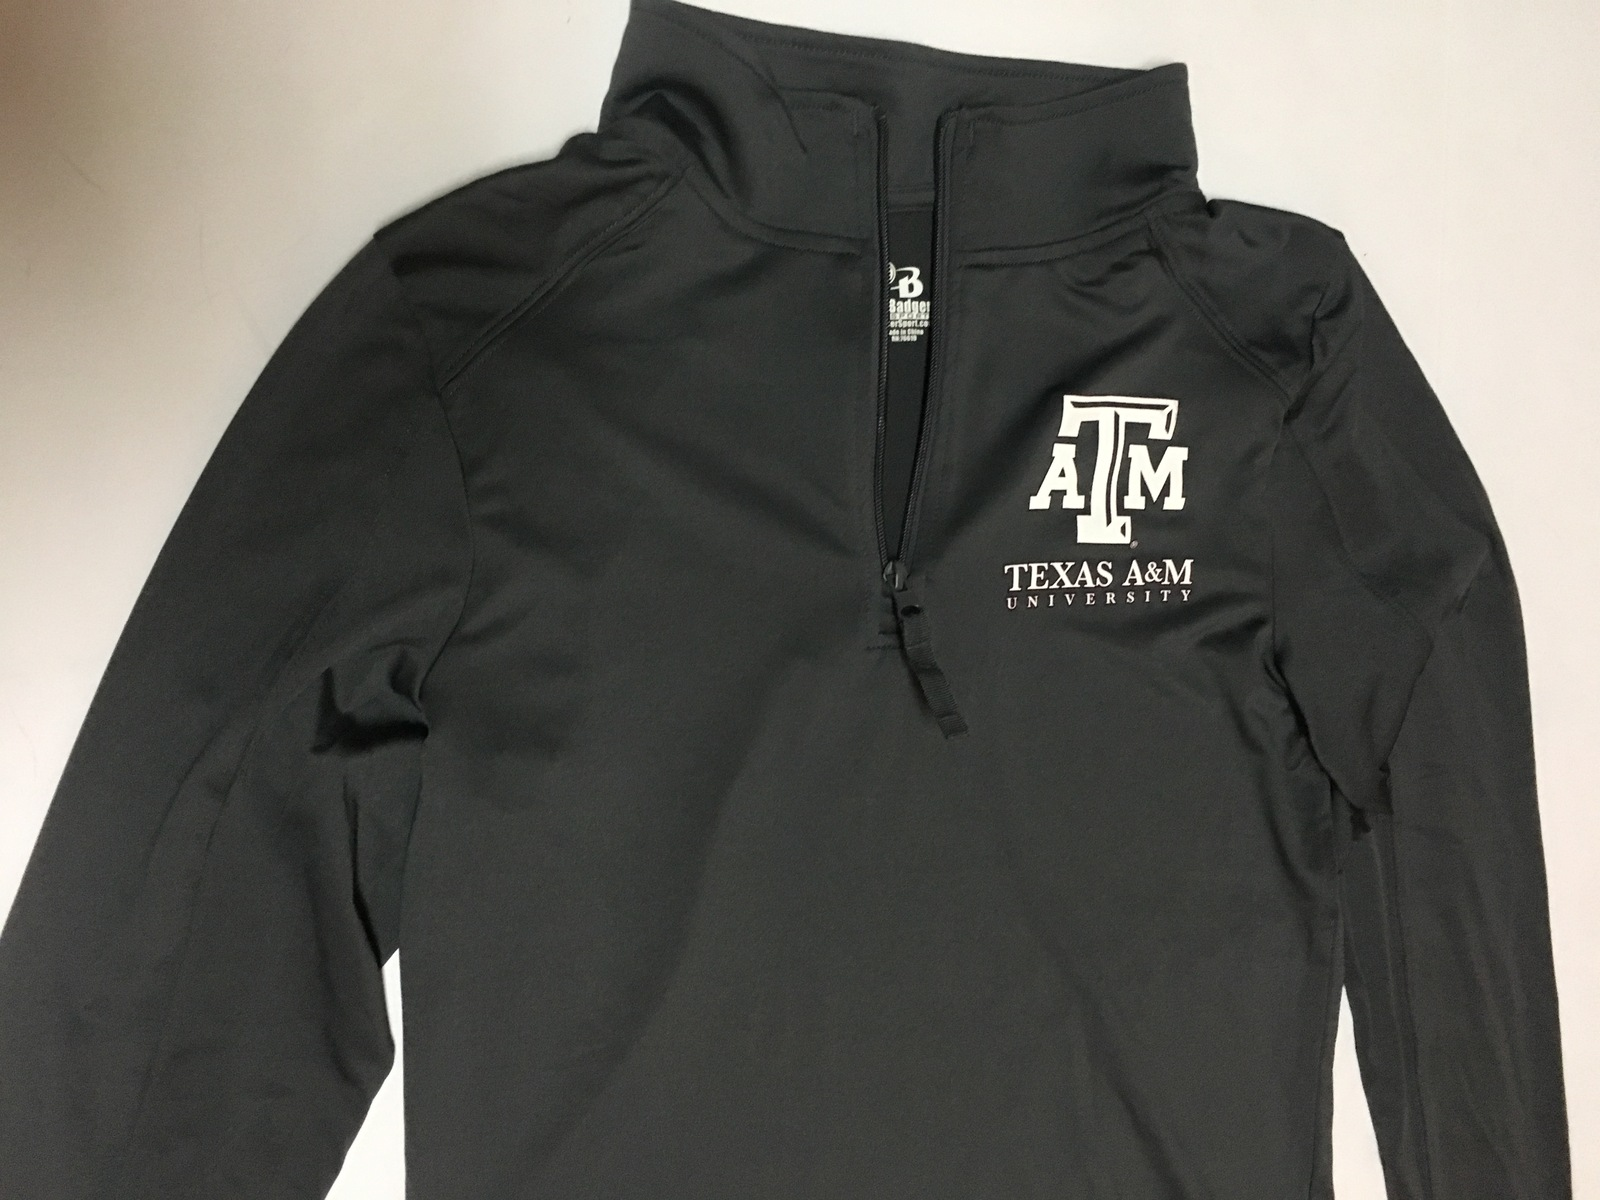 Texas A&M University Ladies Athletic Shirt Gray Sz M Badger Sports